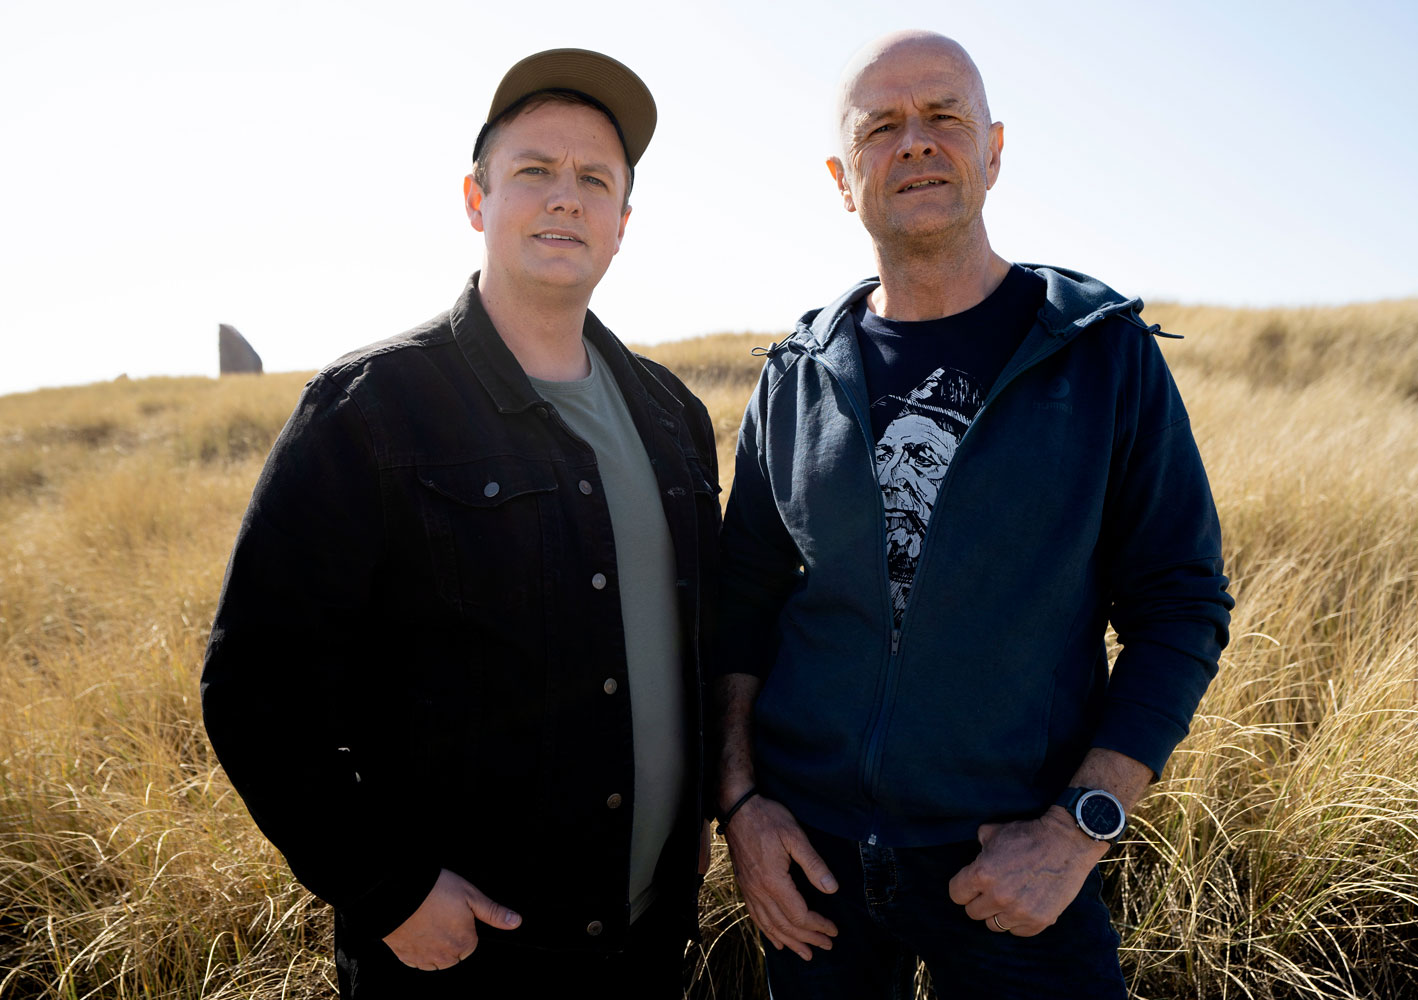 Bent Bro (Tørfisk) & Anders Toft Bro (Grandfætters)